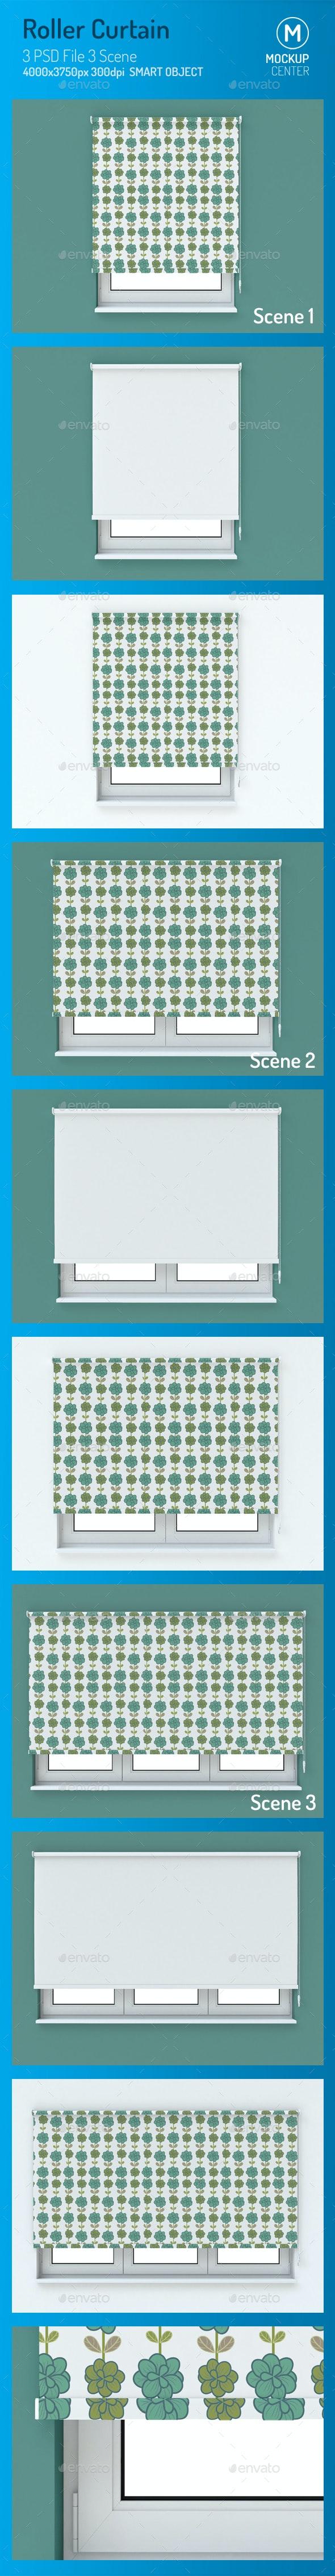 Roller Curtain Mockup - Print Product Mock-Ups